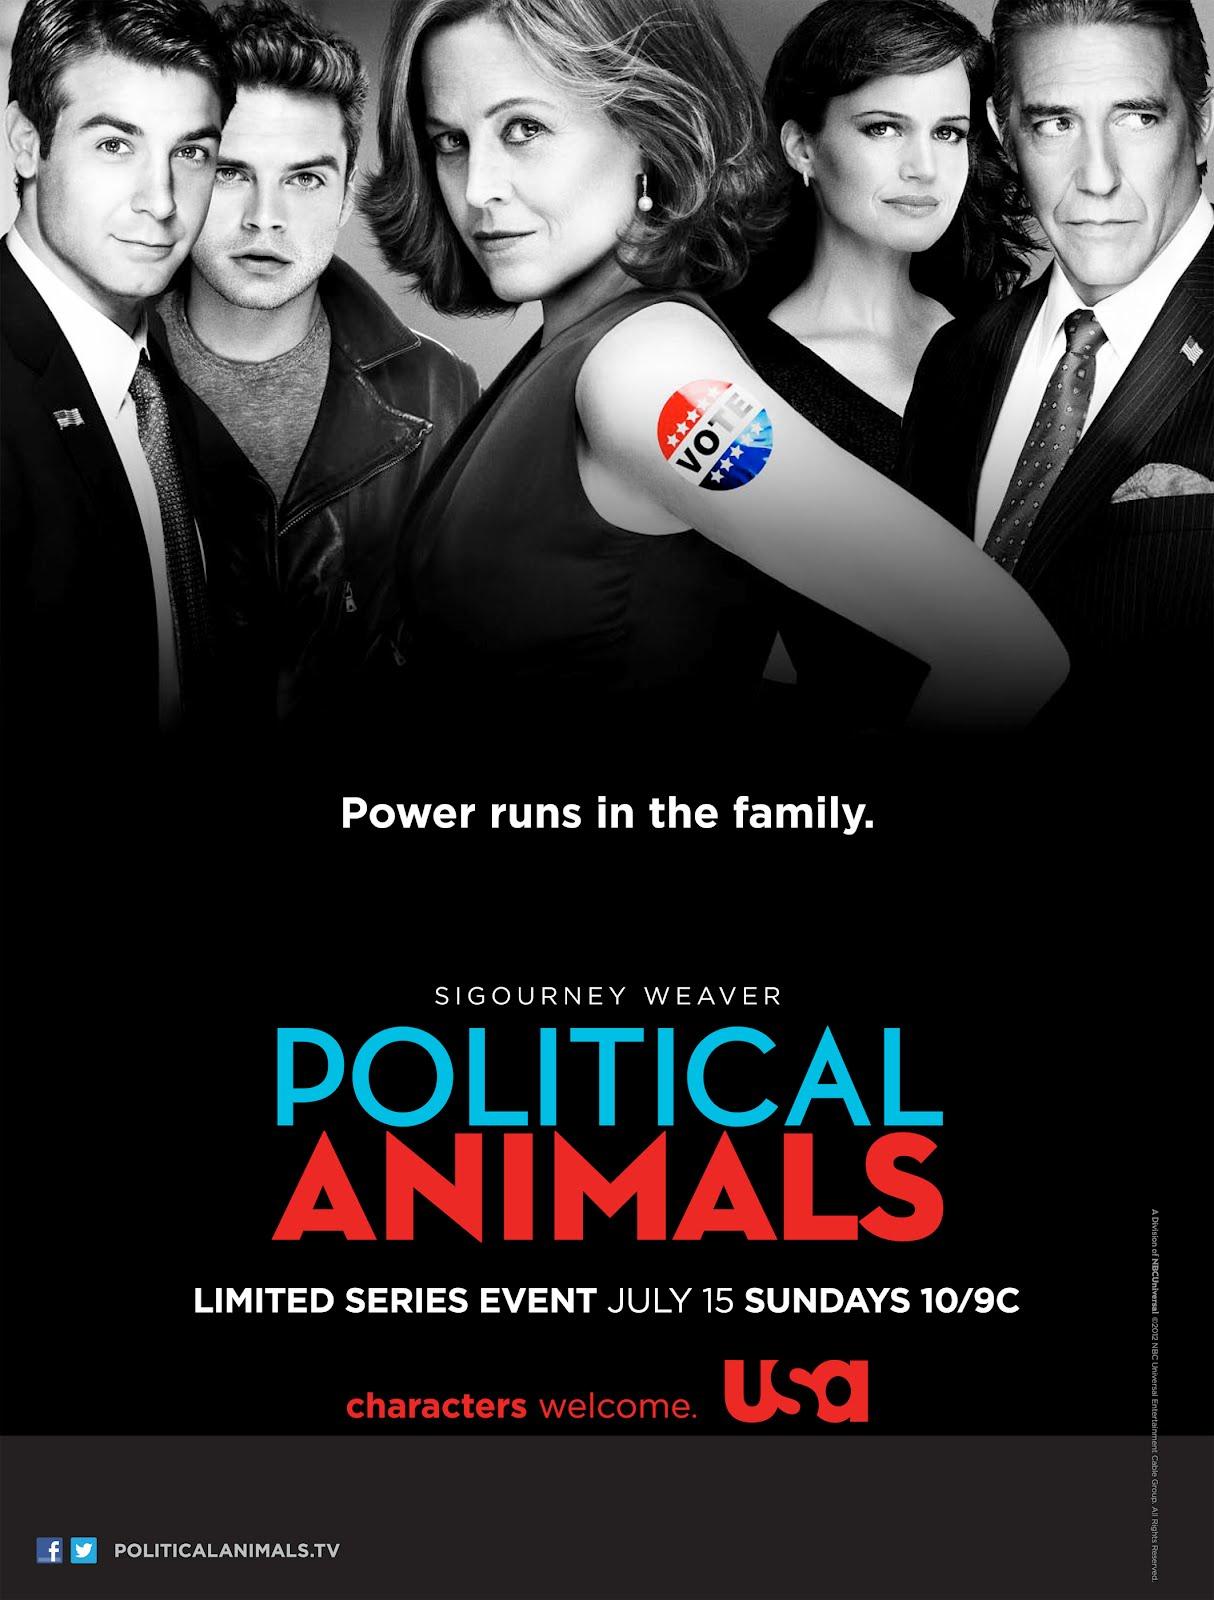 http://4.bp.blogspot.com/-f6e_g5GwwHo/UAQHcz_ZymI/AAAAAAAANJY/Mski7UZGK80/s1600/Political+Animals+s1+Poster+001.jpg